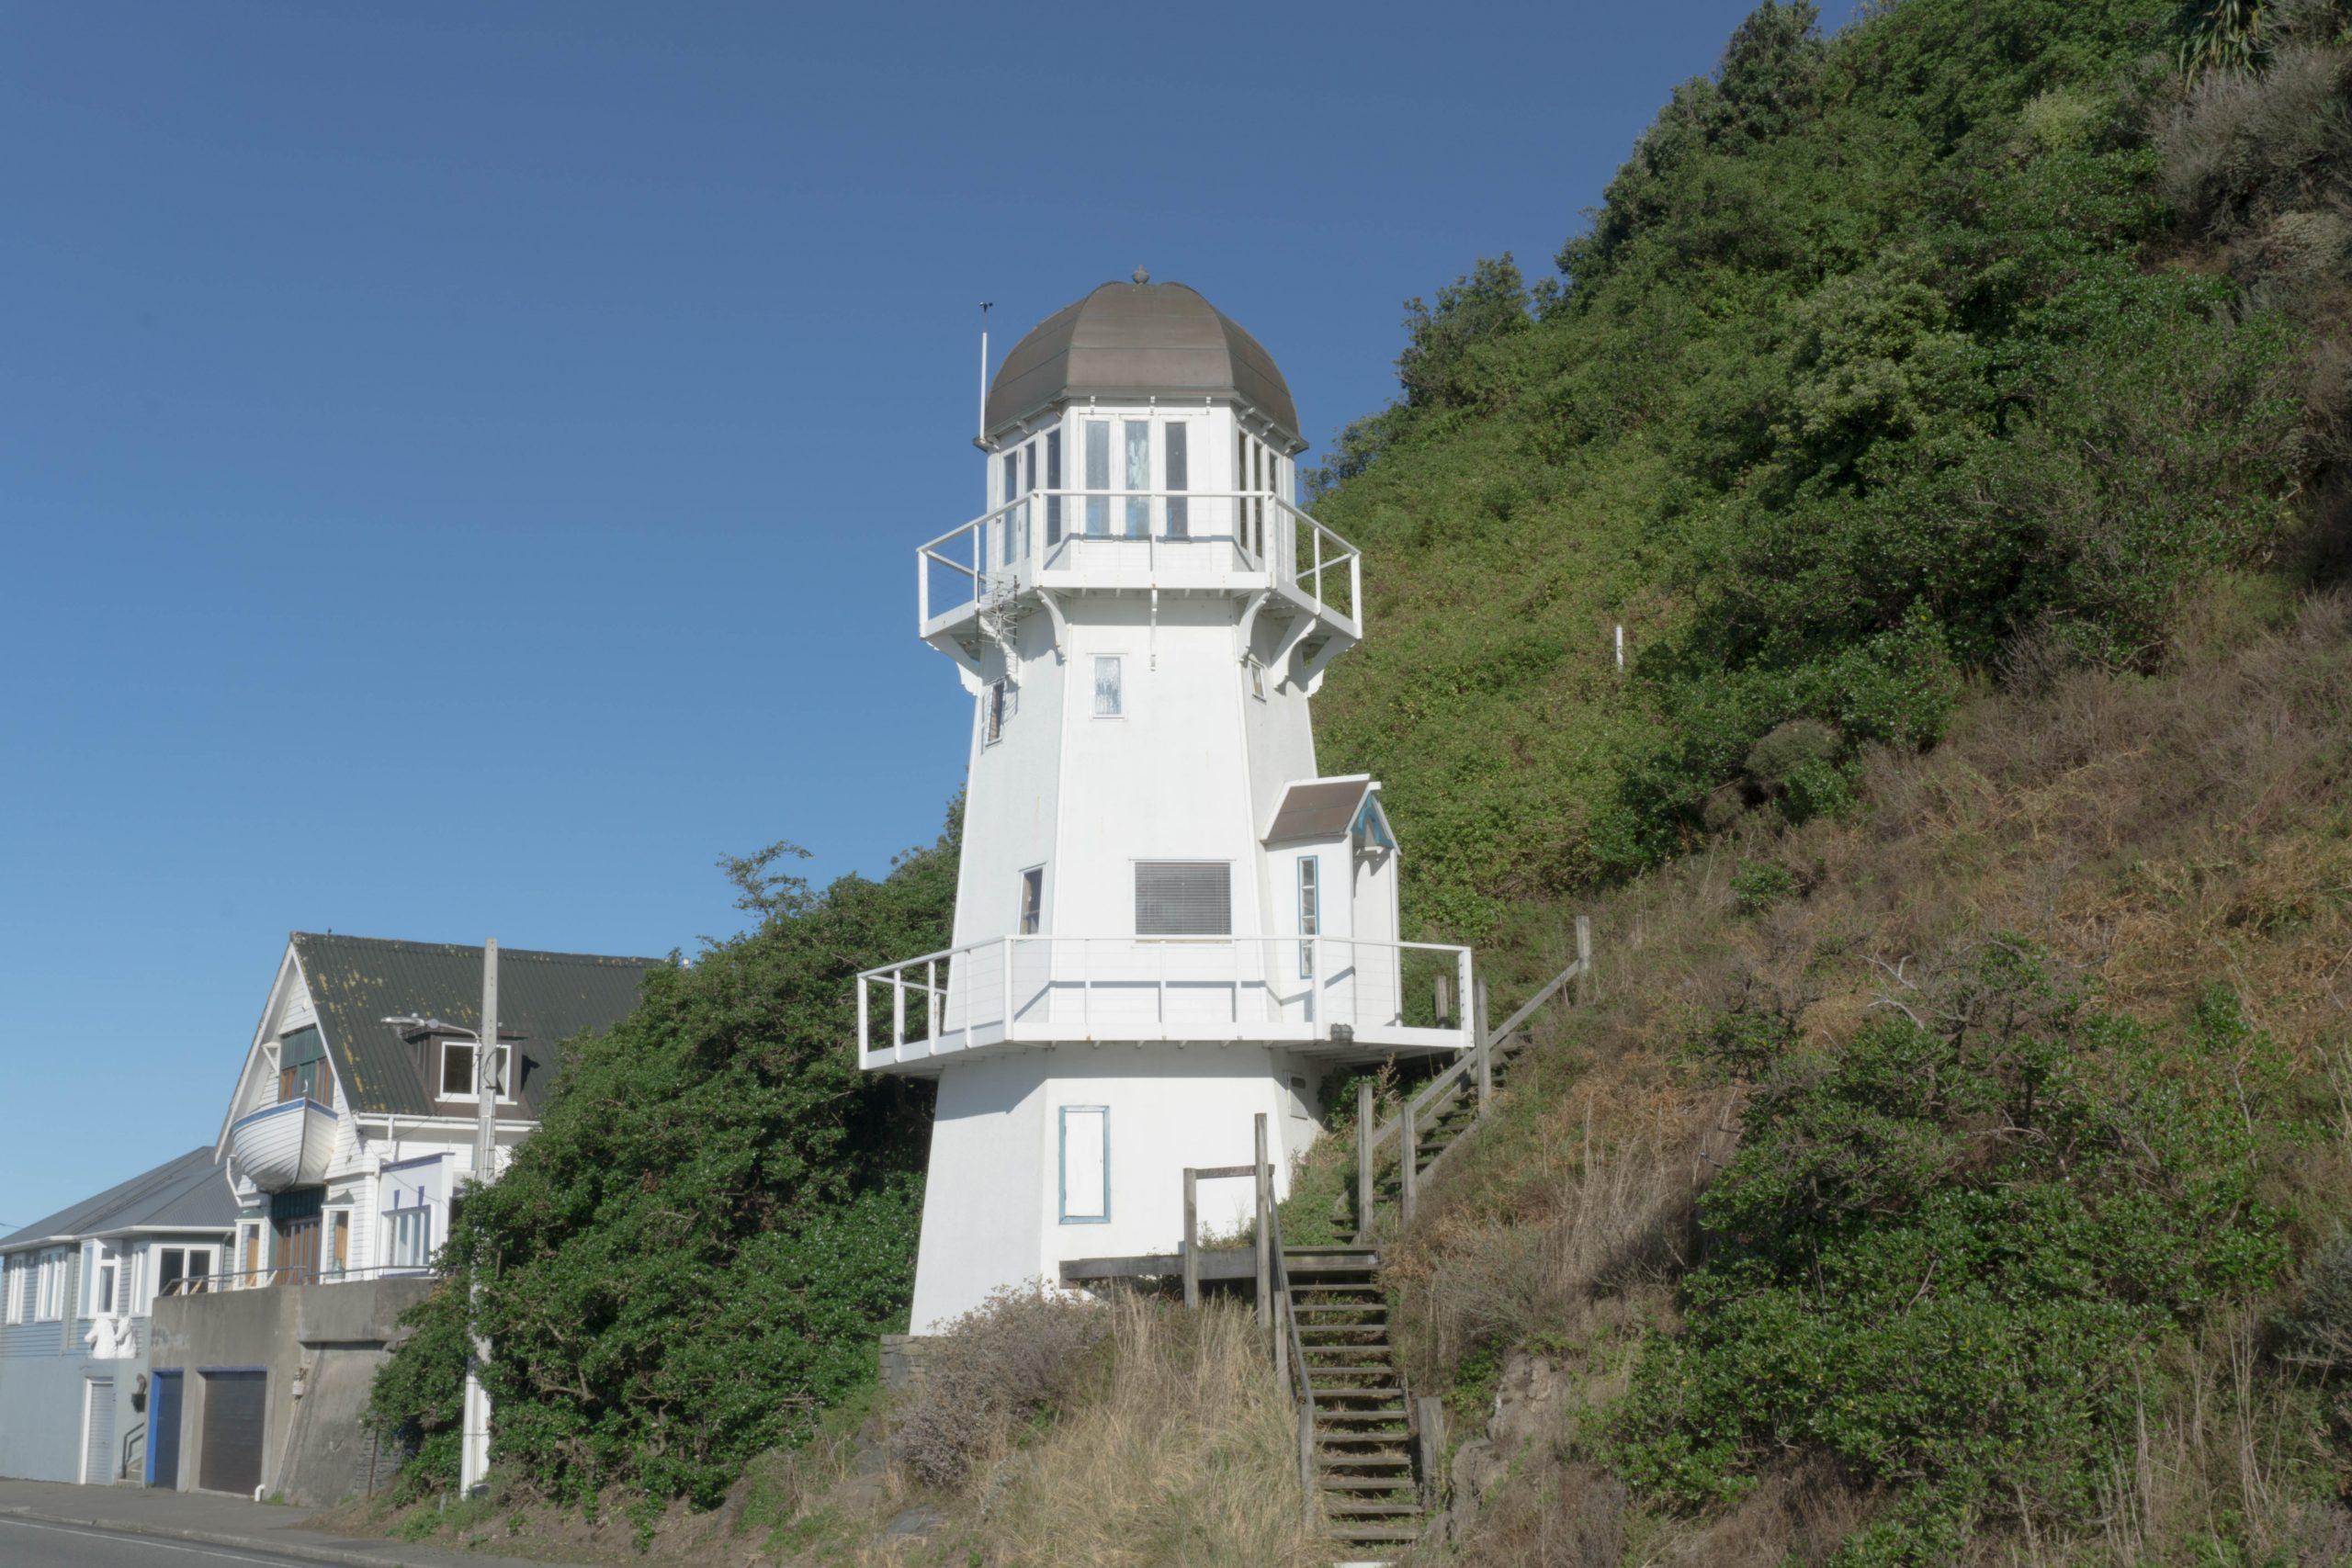 Island Bay lighthouse Airbnb